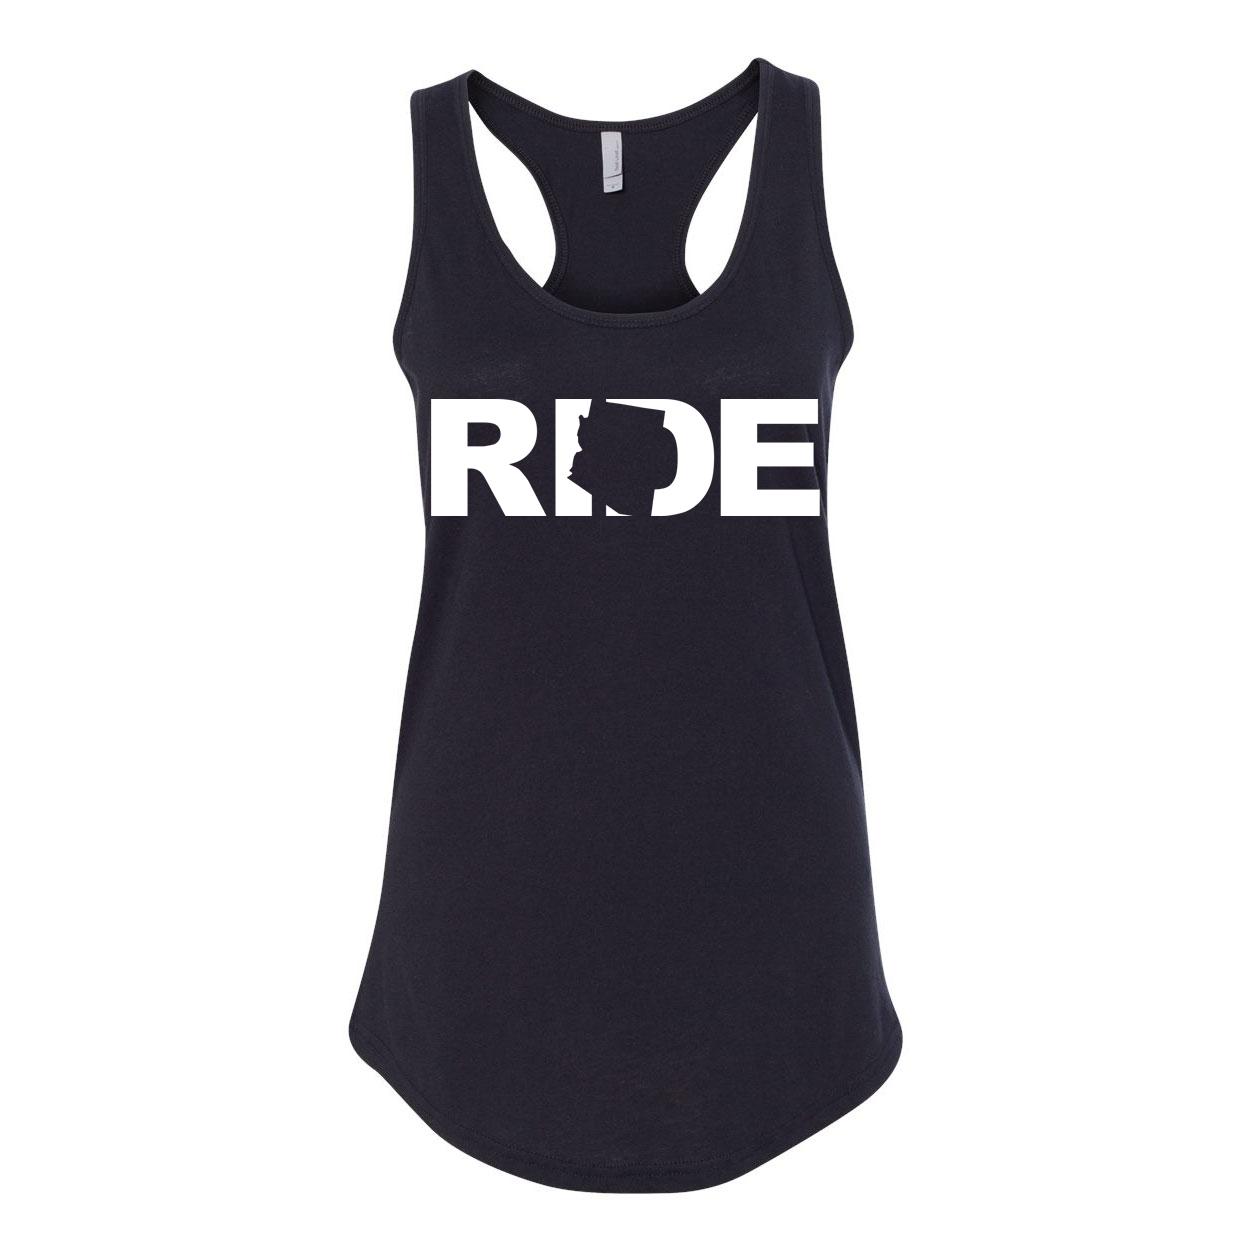 Ride Arizona Classic Women's Racerback Tank Top Black (White Logo)